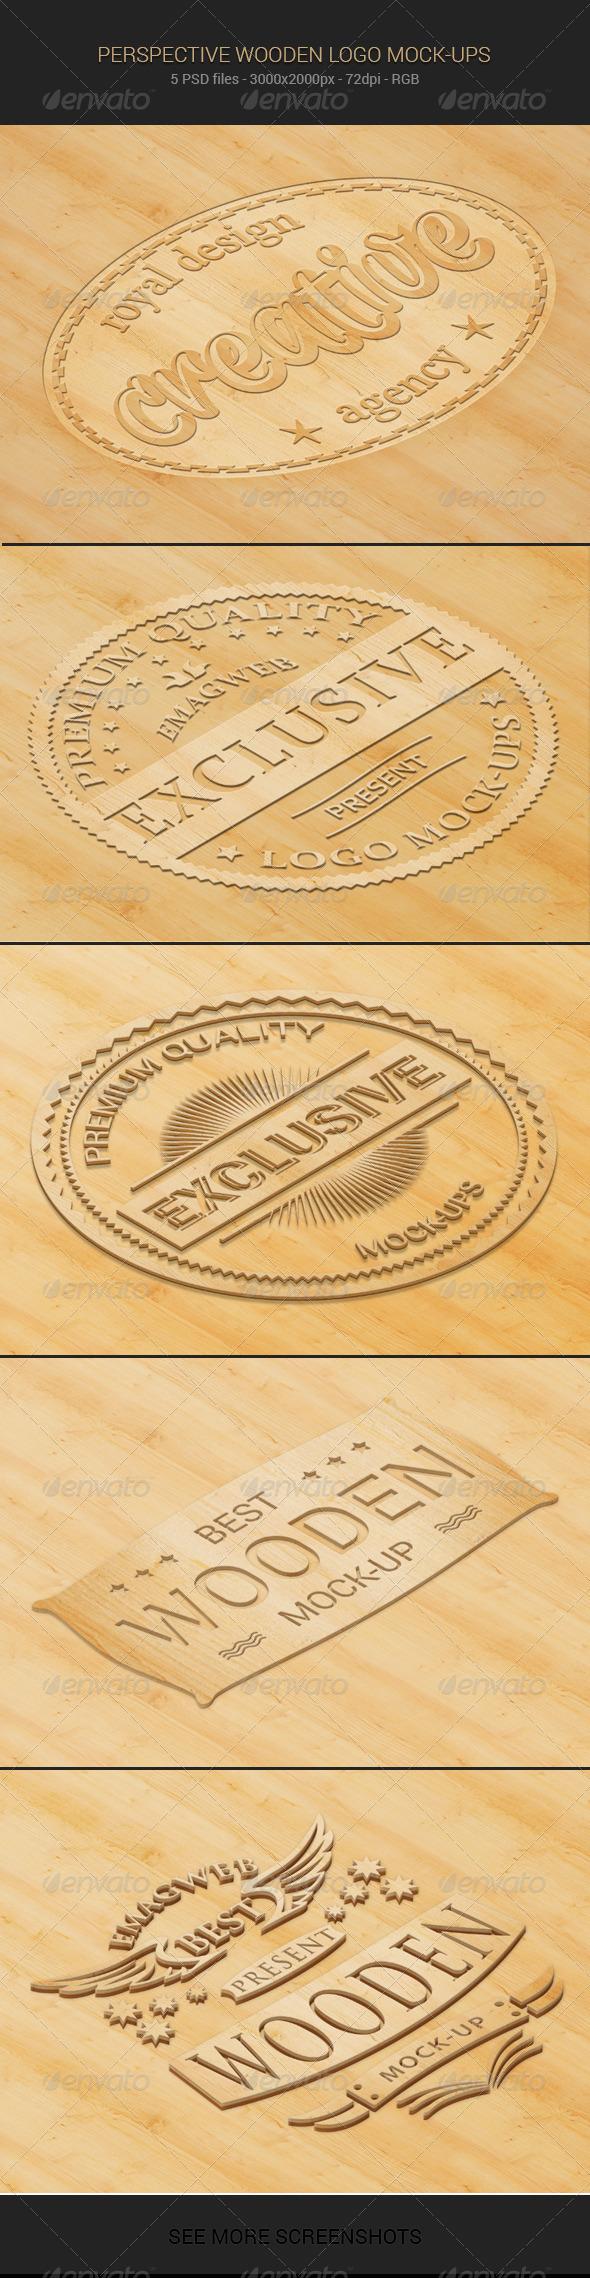 Perspective Wooden Logo Mock-ups - Logo Product Mock-Ups